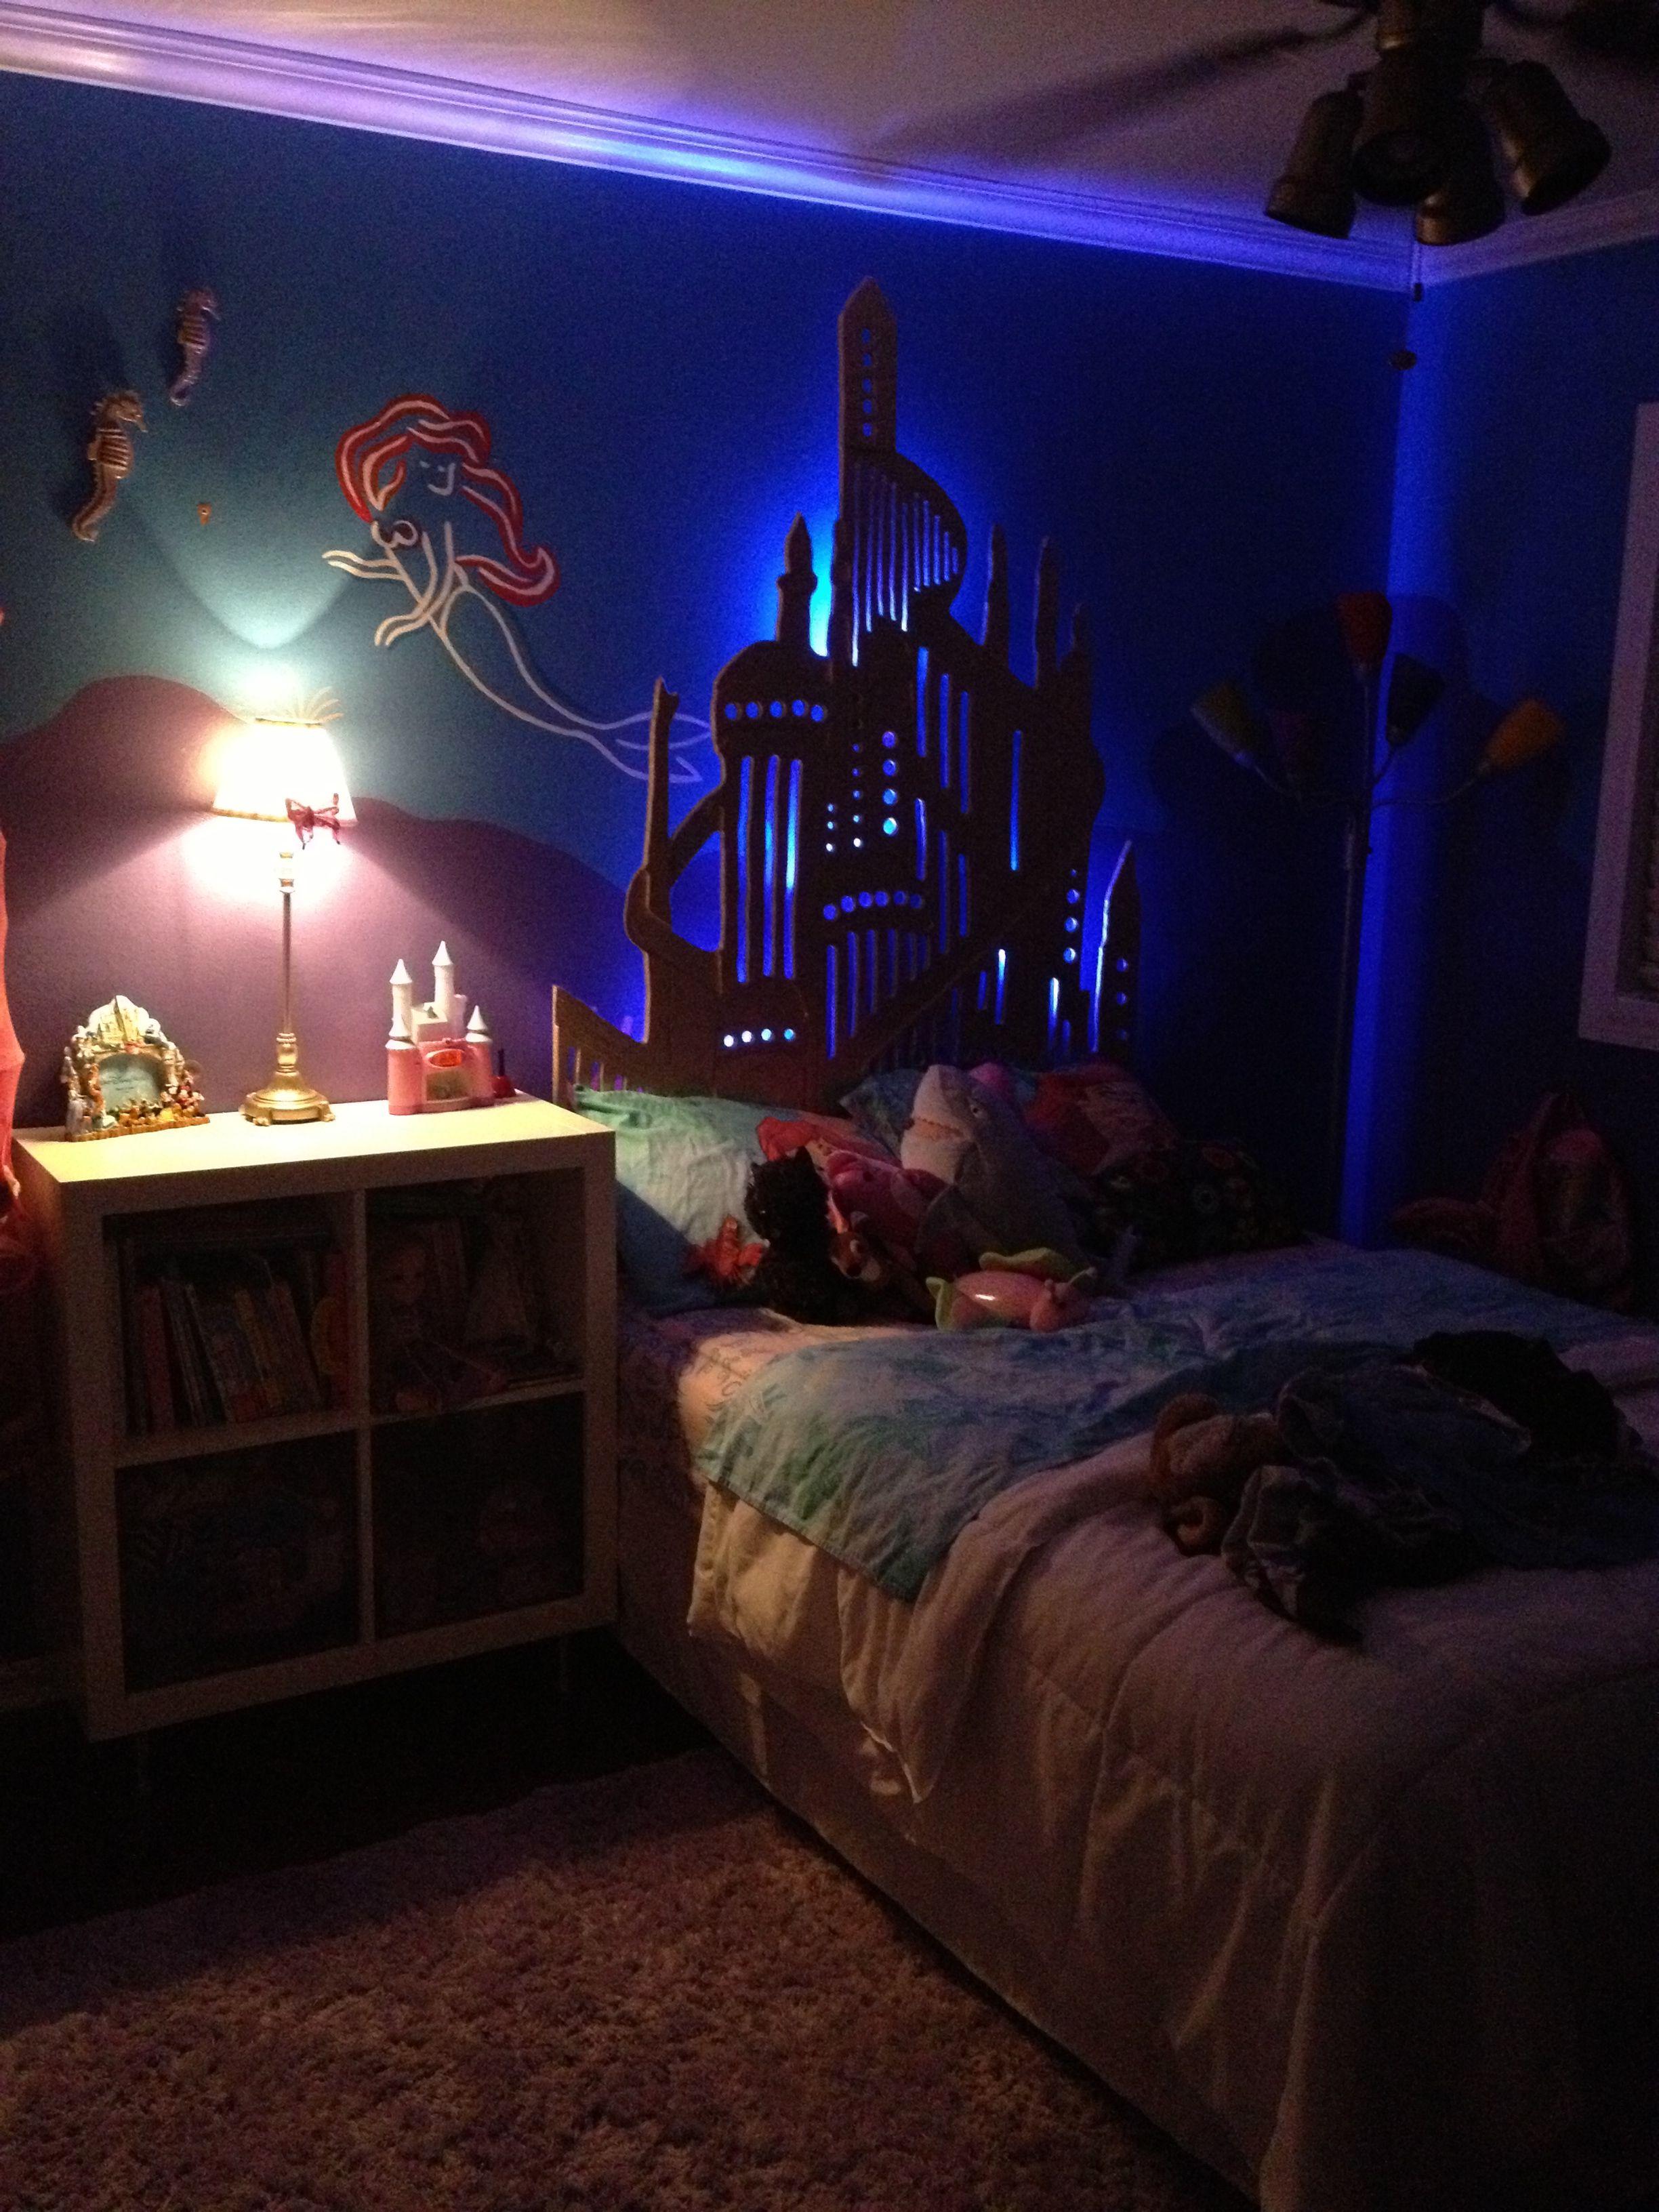 Little Mermaid Bedroom For Our Princess Little Mermaid